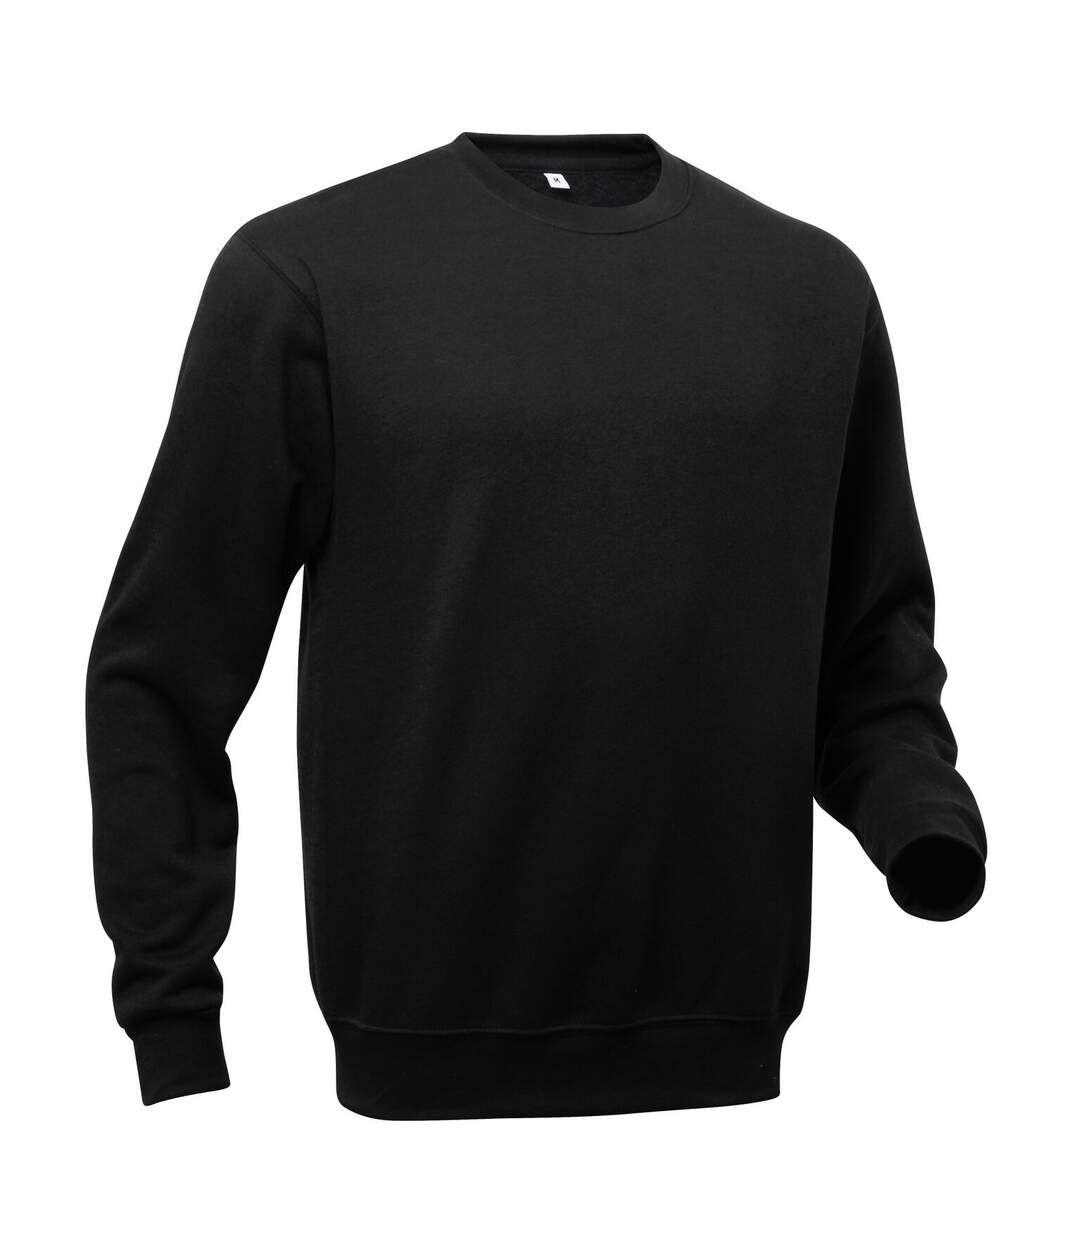 Pro RTX Mens Pro Sweatshirt (Black) - UTRW6174